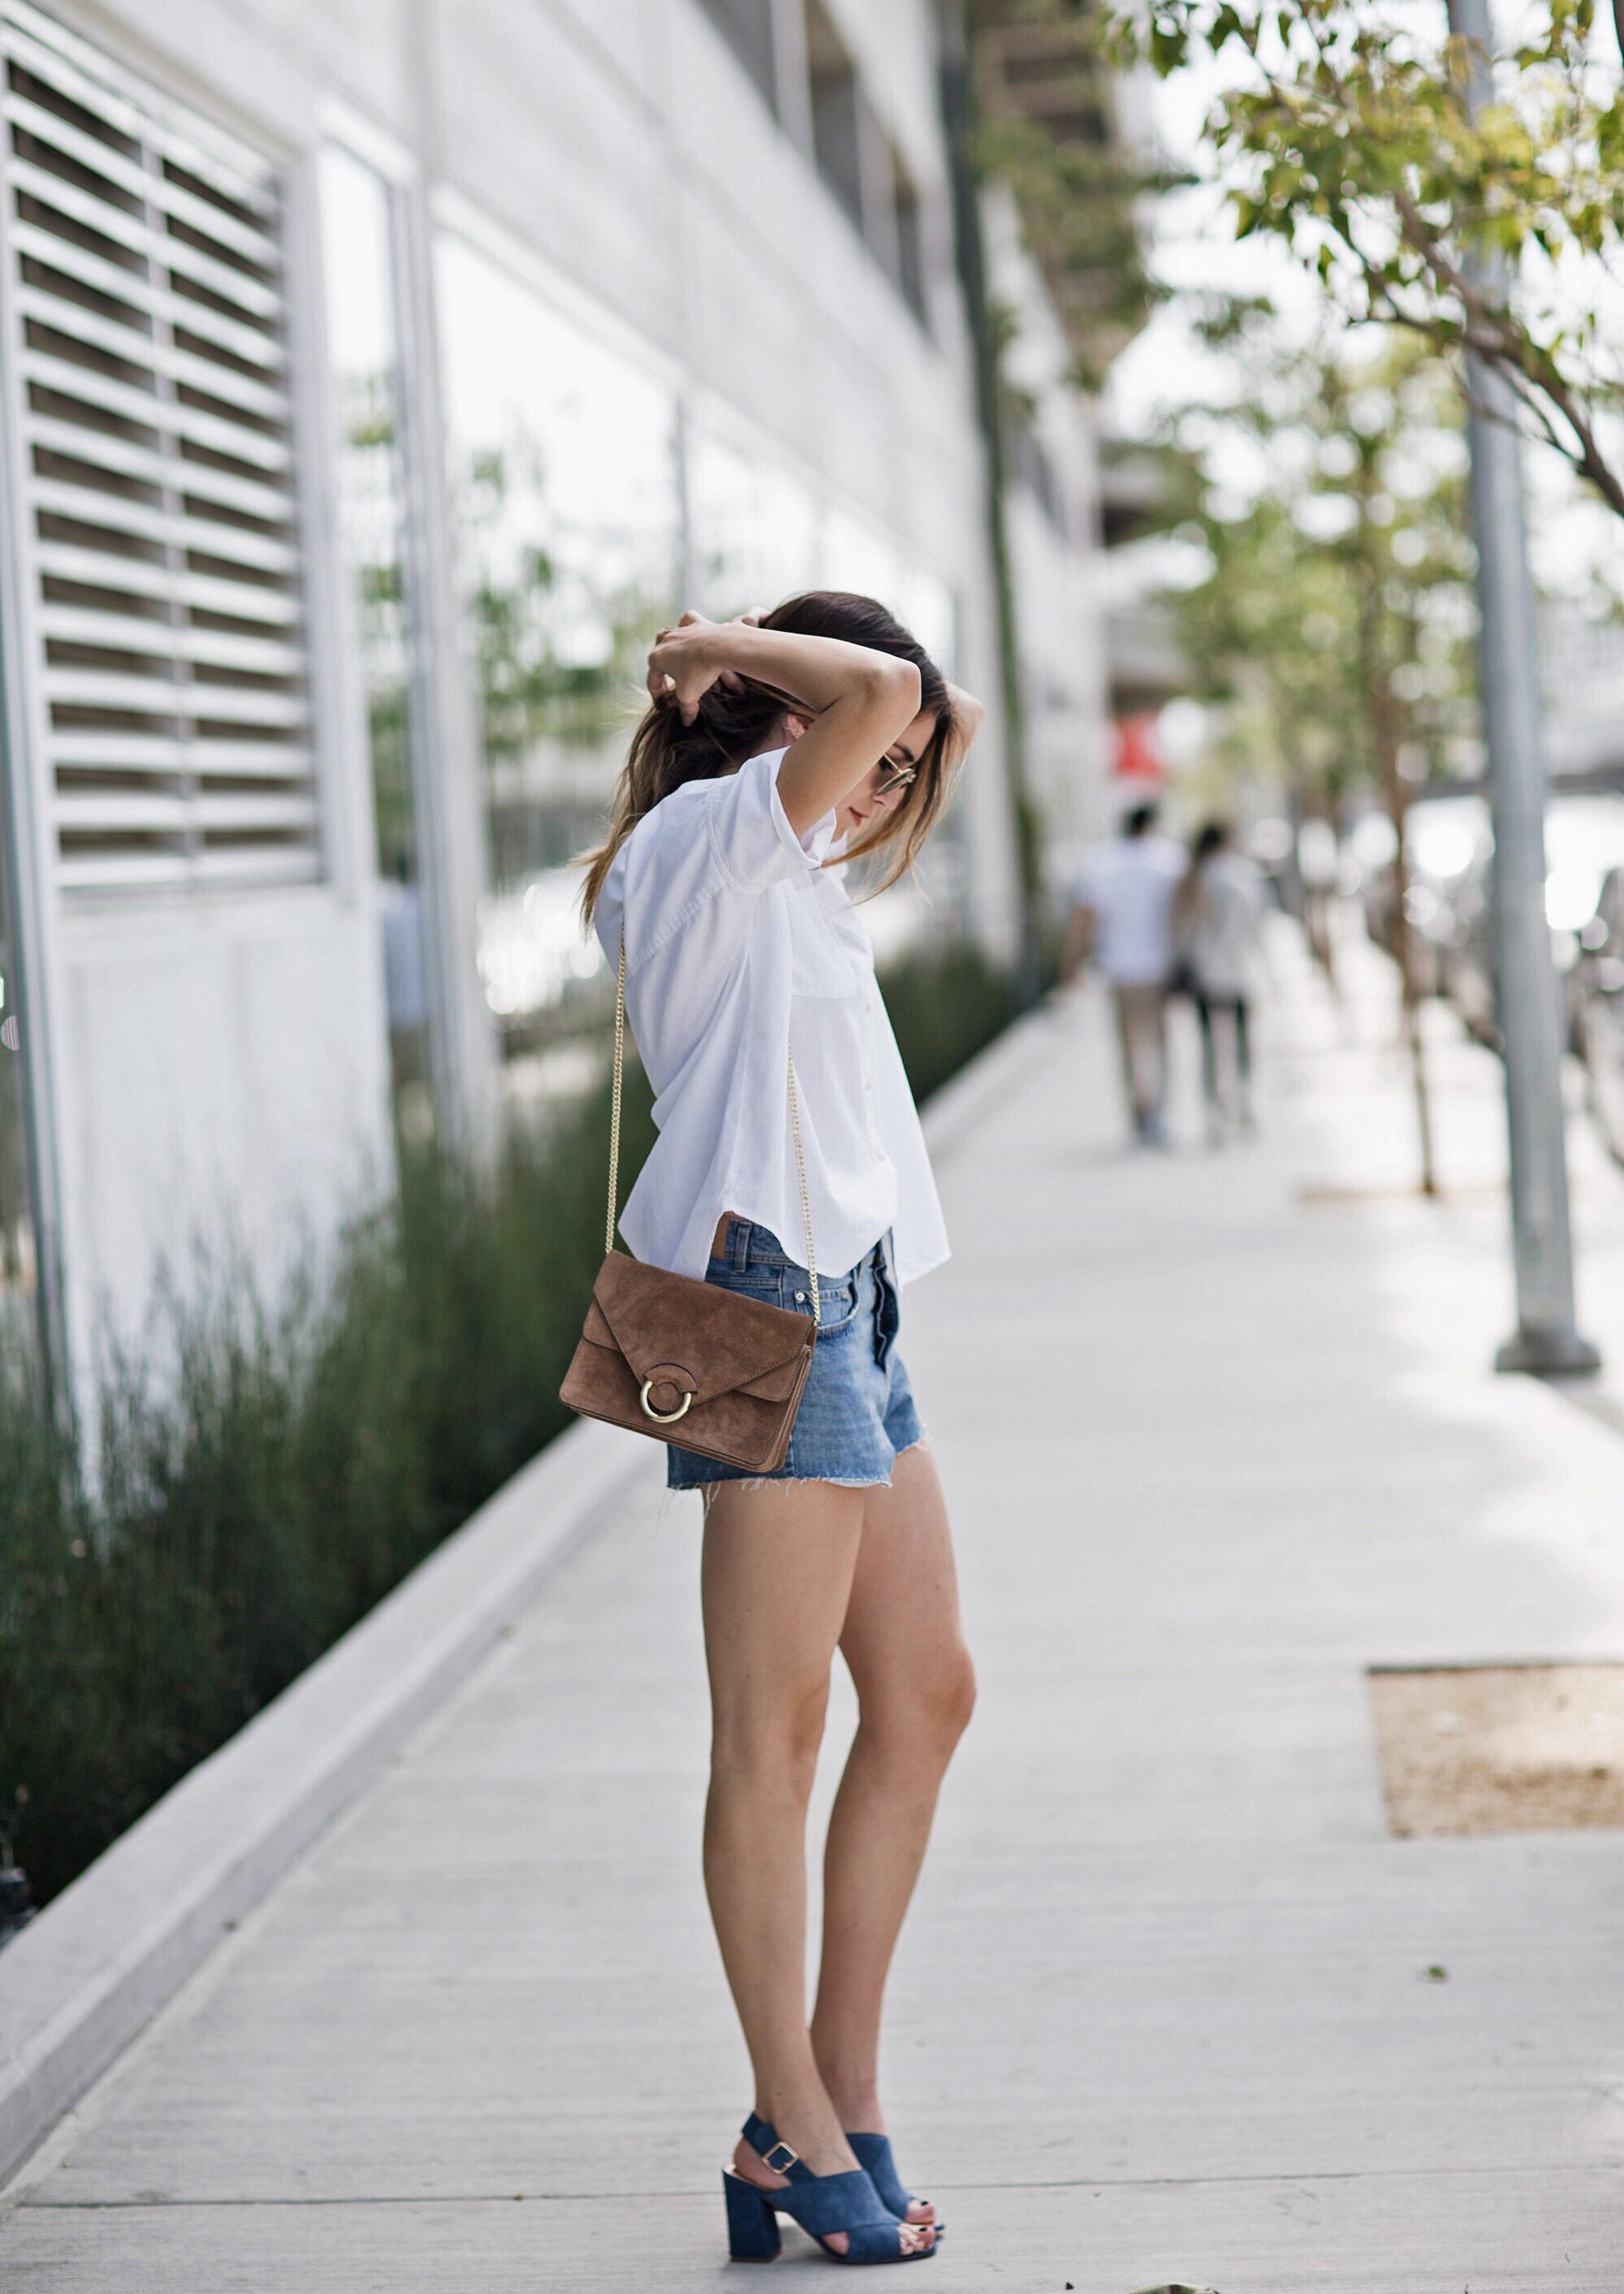 brittanyxavier.com Brittany Xavier